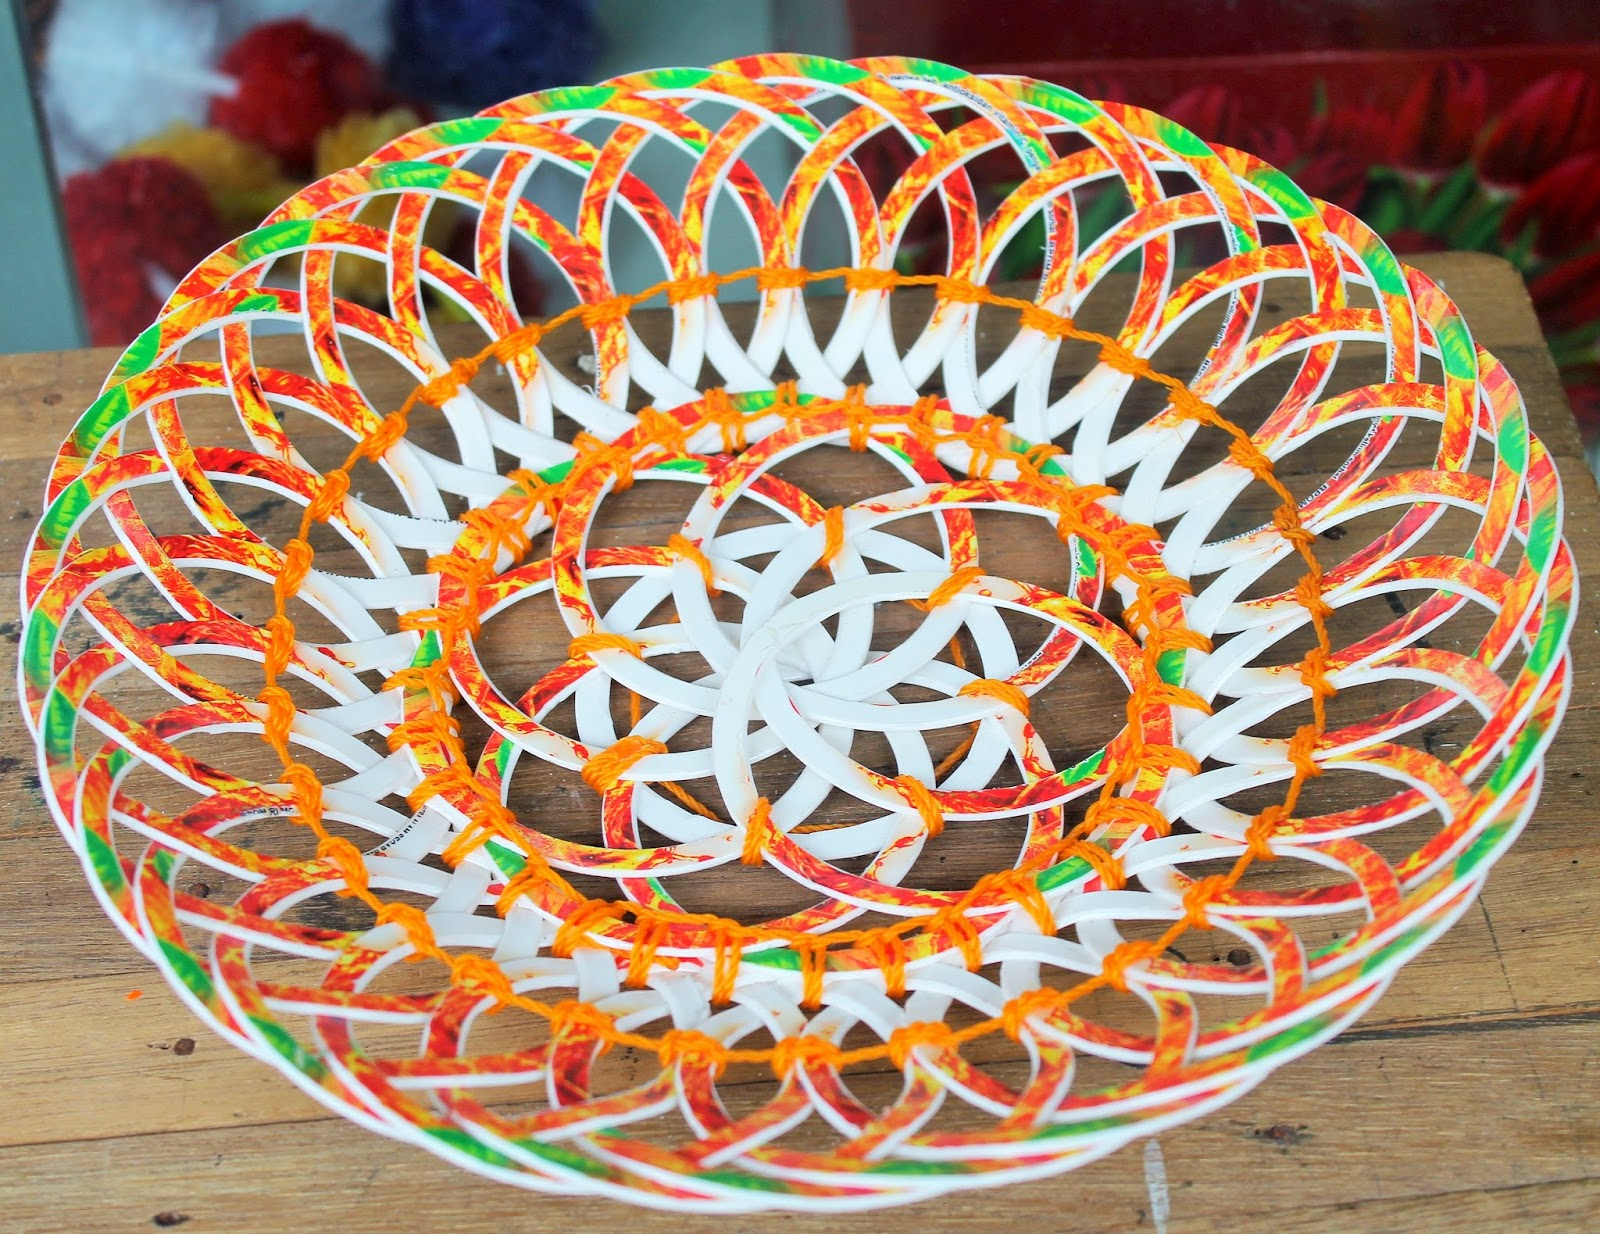 Kerajinan Tangan dari Gelas Plastik dan Cara Membuatnya